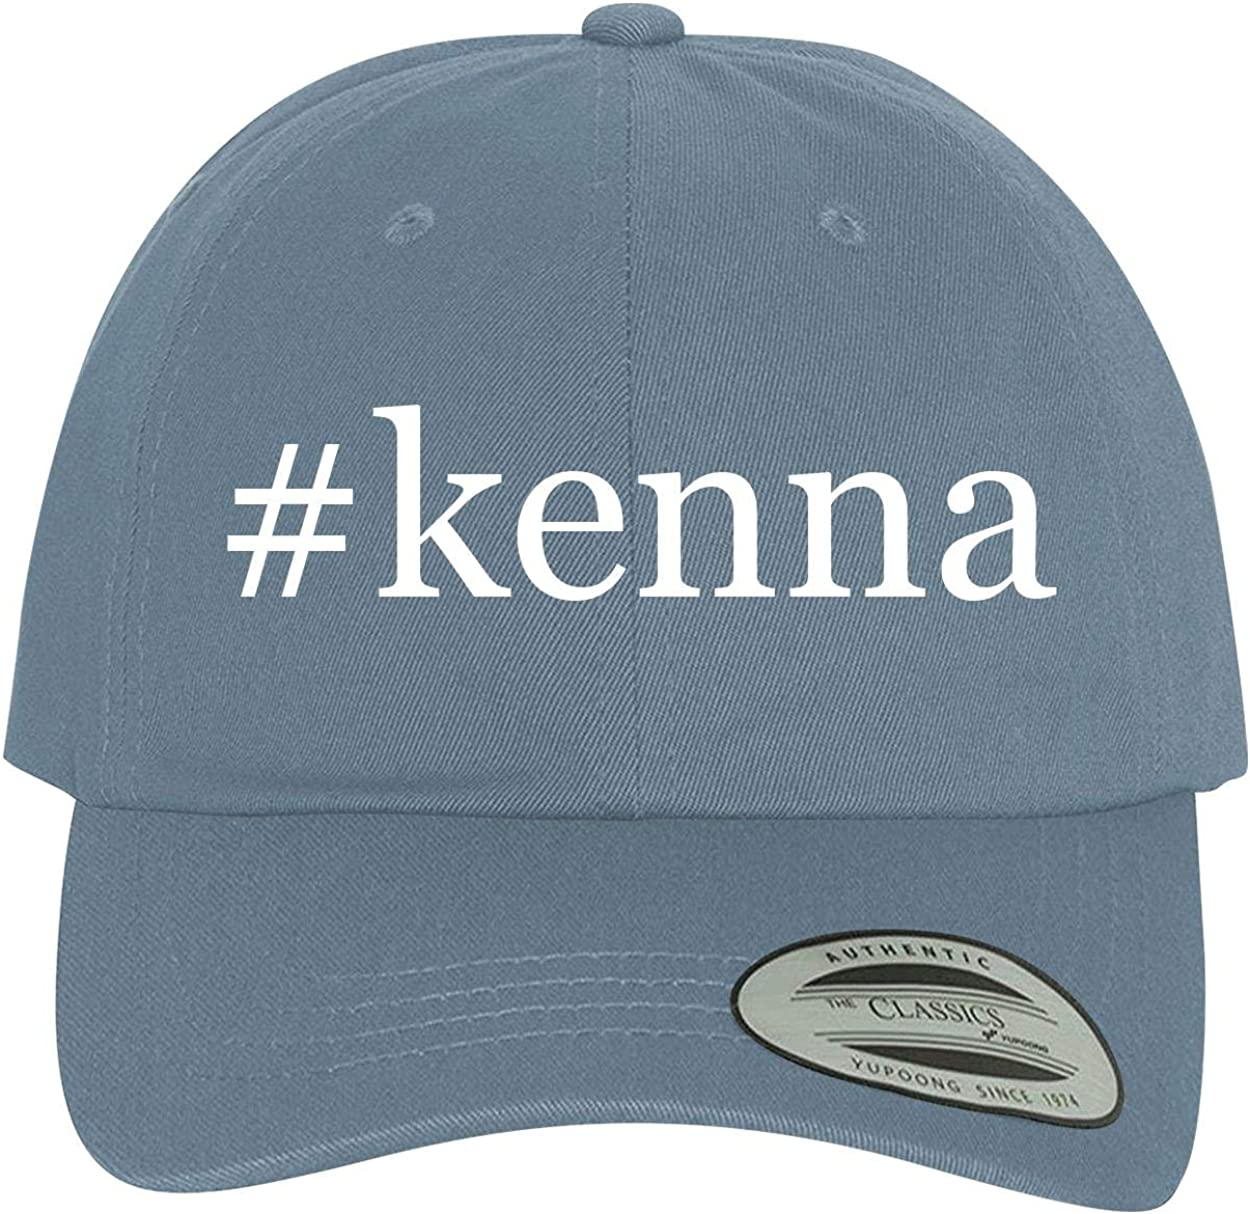 Comfortable Dad Hat Baseball Cap BH Cool Designs #Kenna